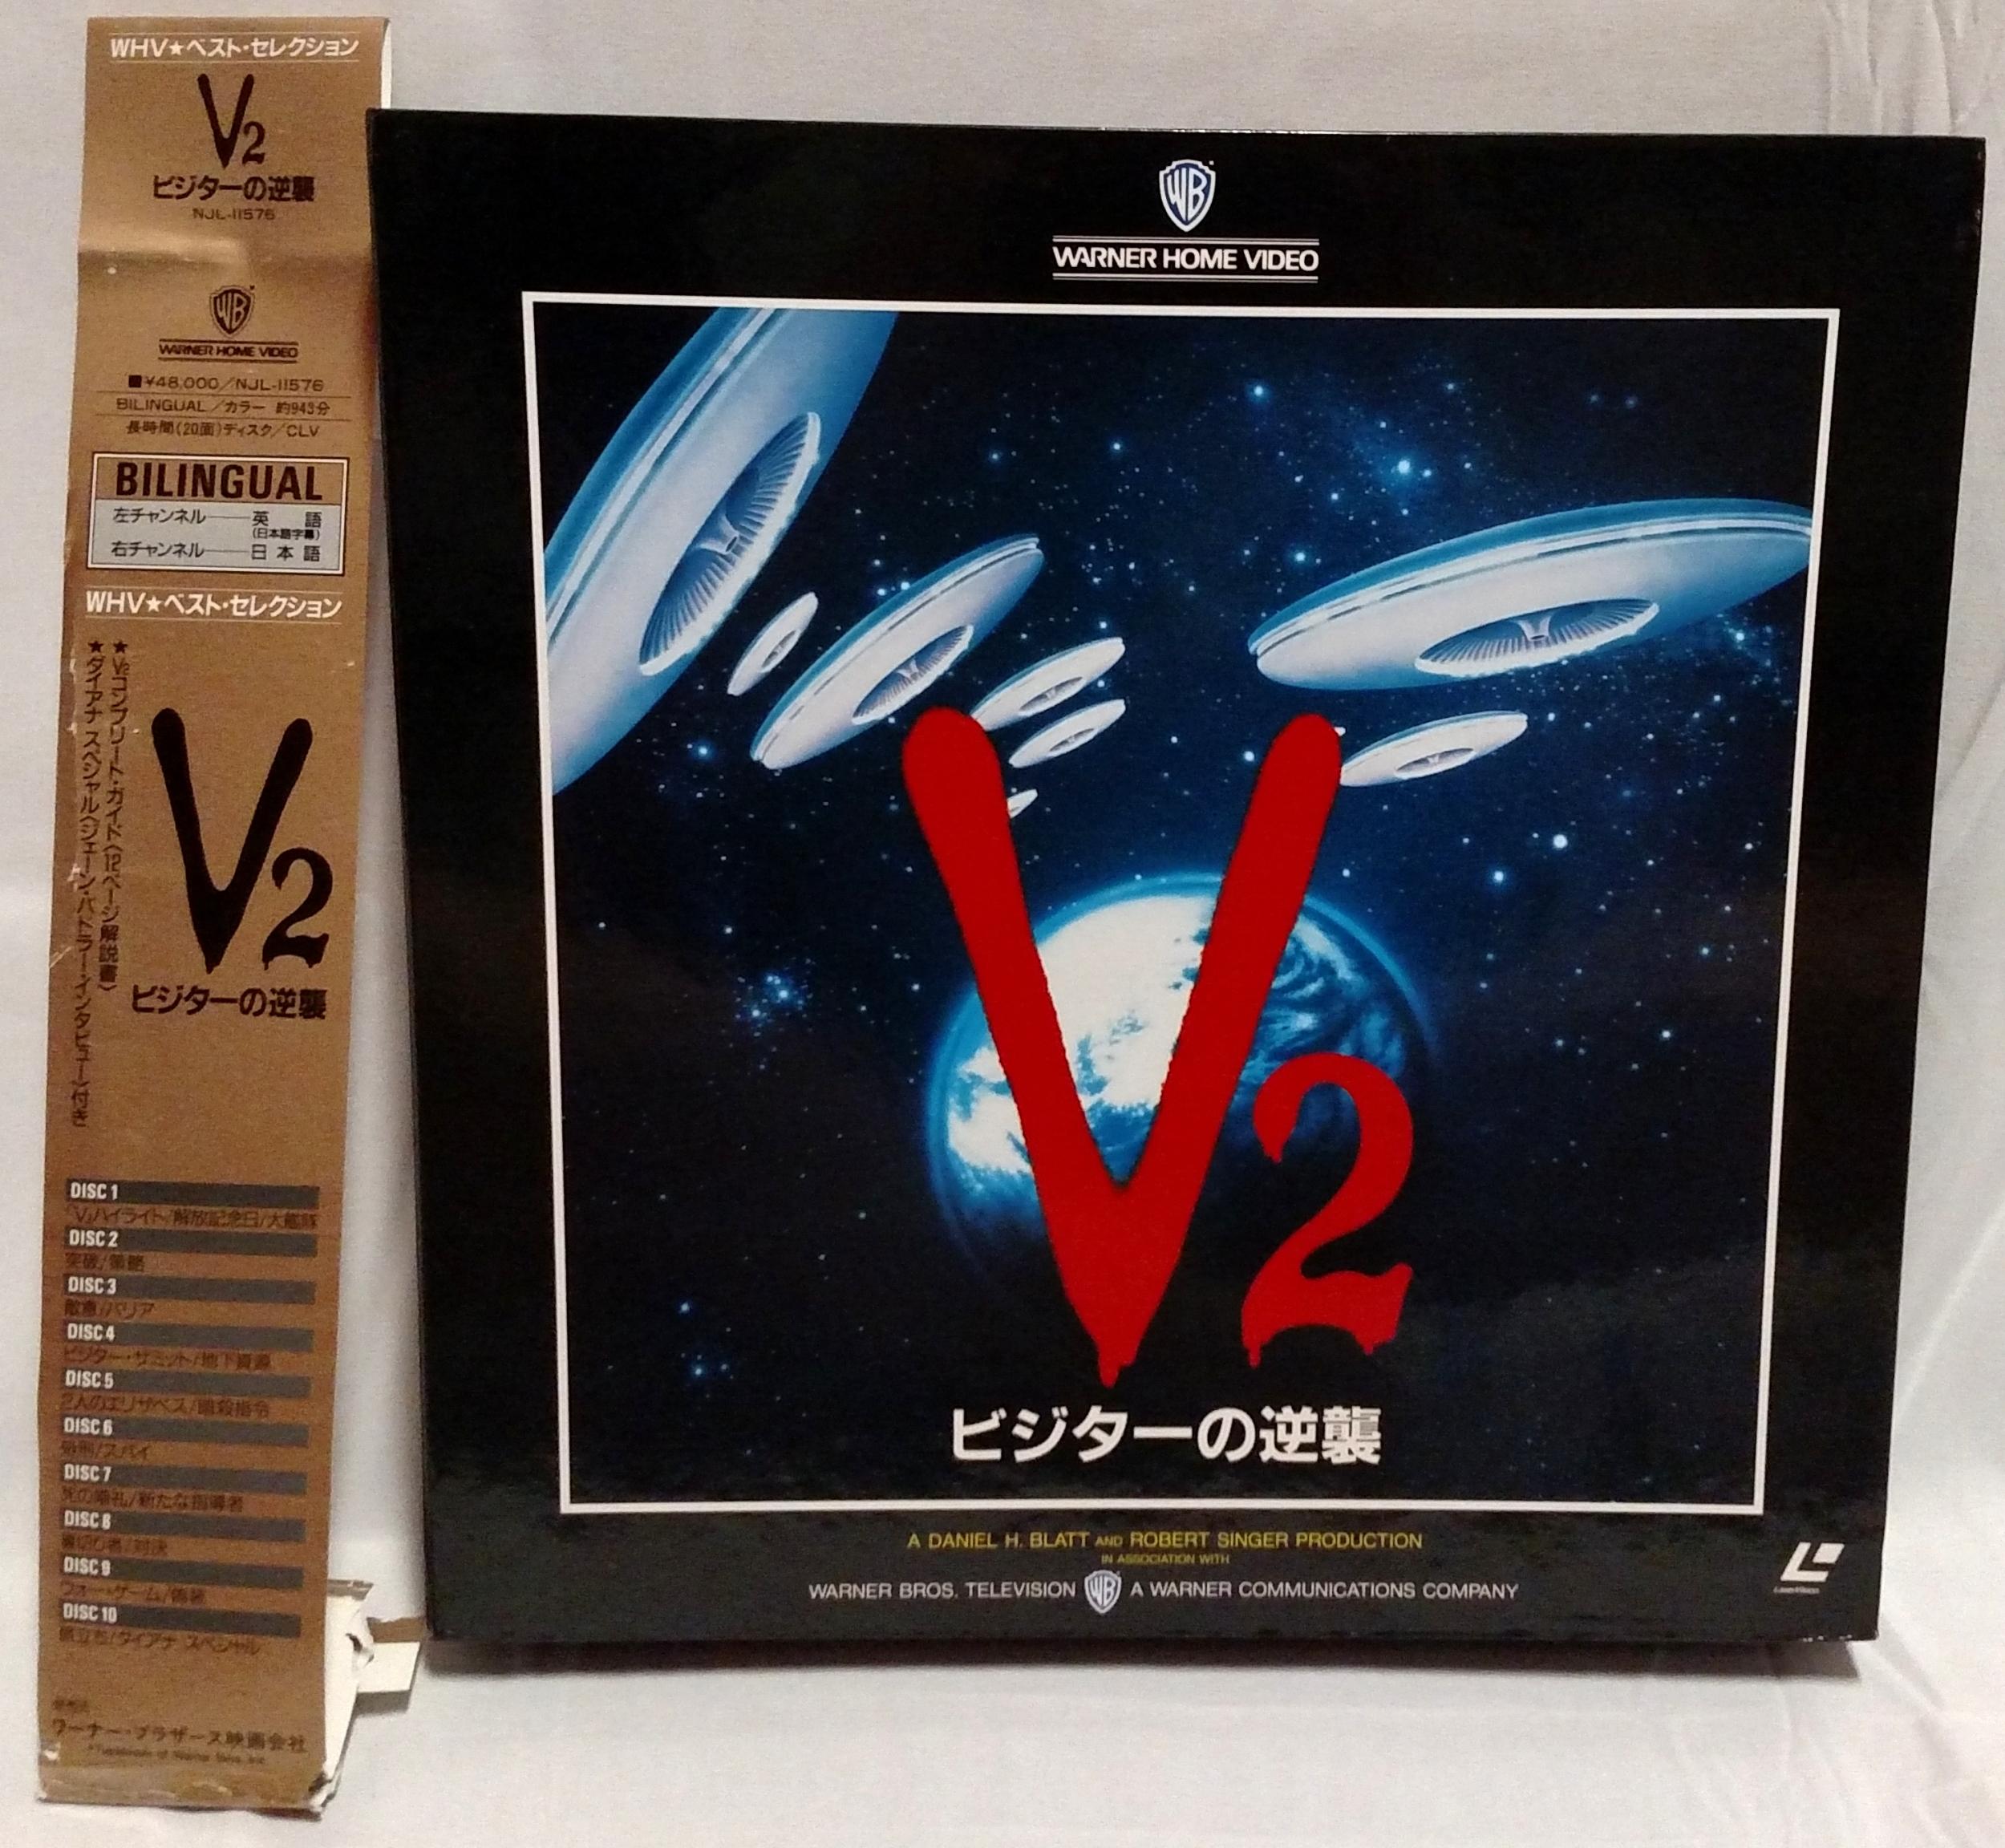 V2 - Japanese Laserdisc Box Front